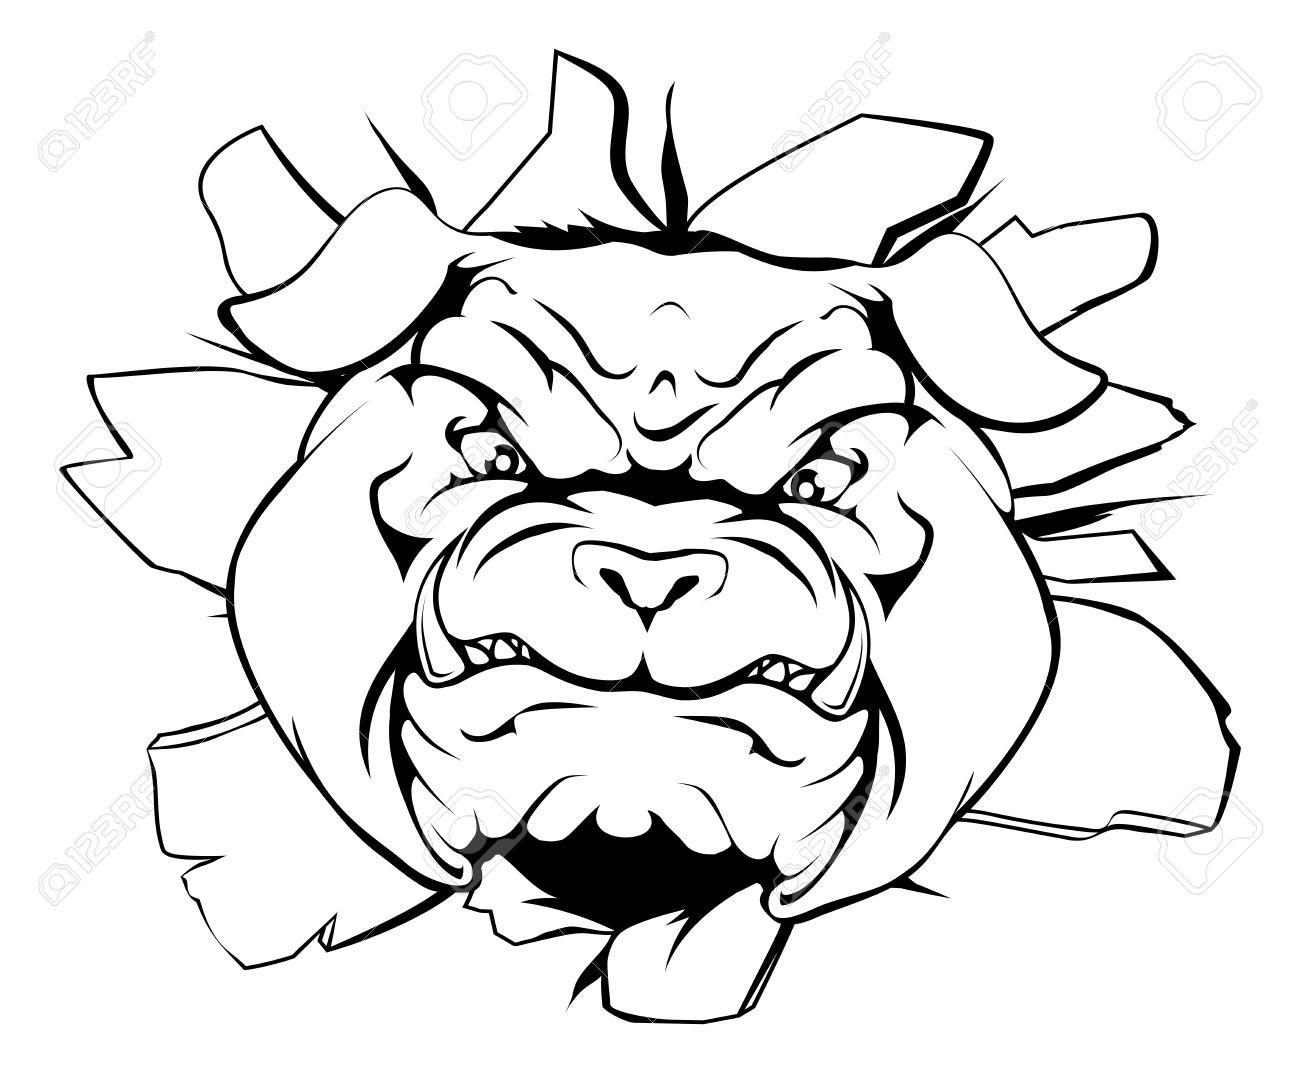 1300x1073 An Illustration Of A Cartoon Tough Bulldog Character Face Tearing